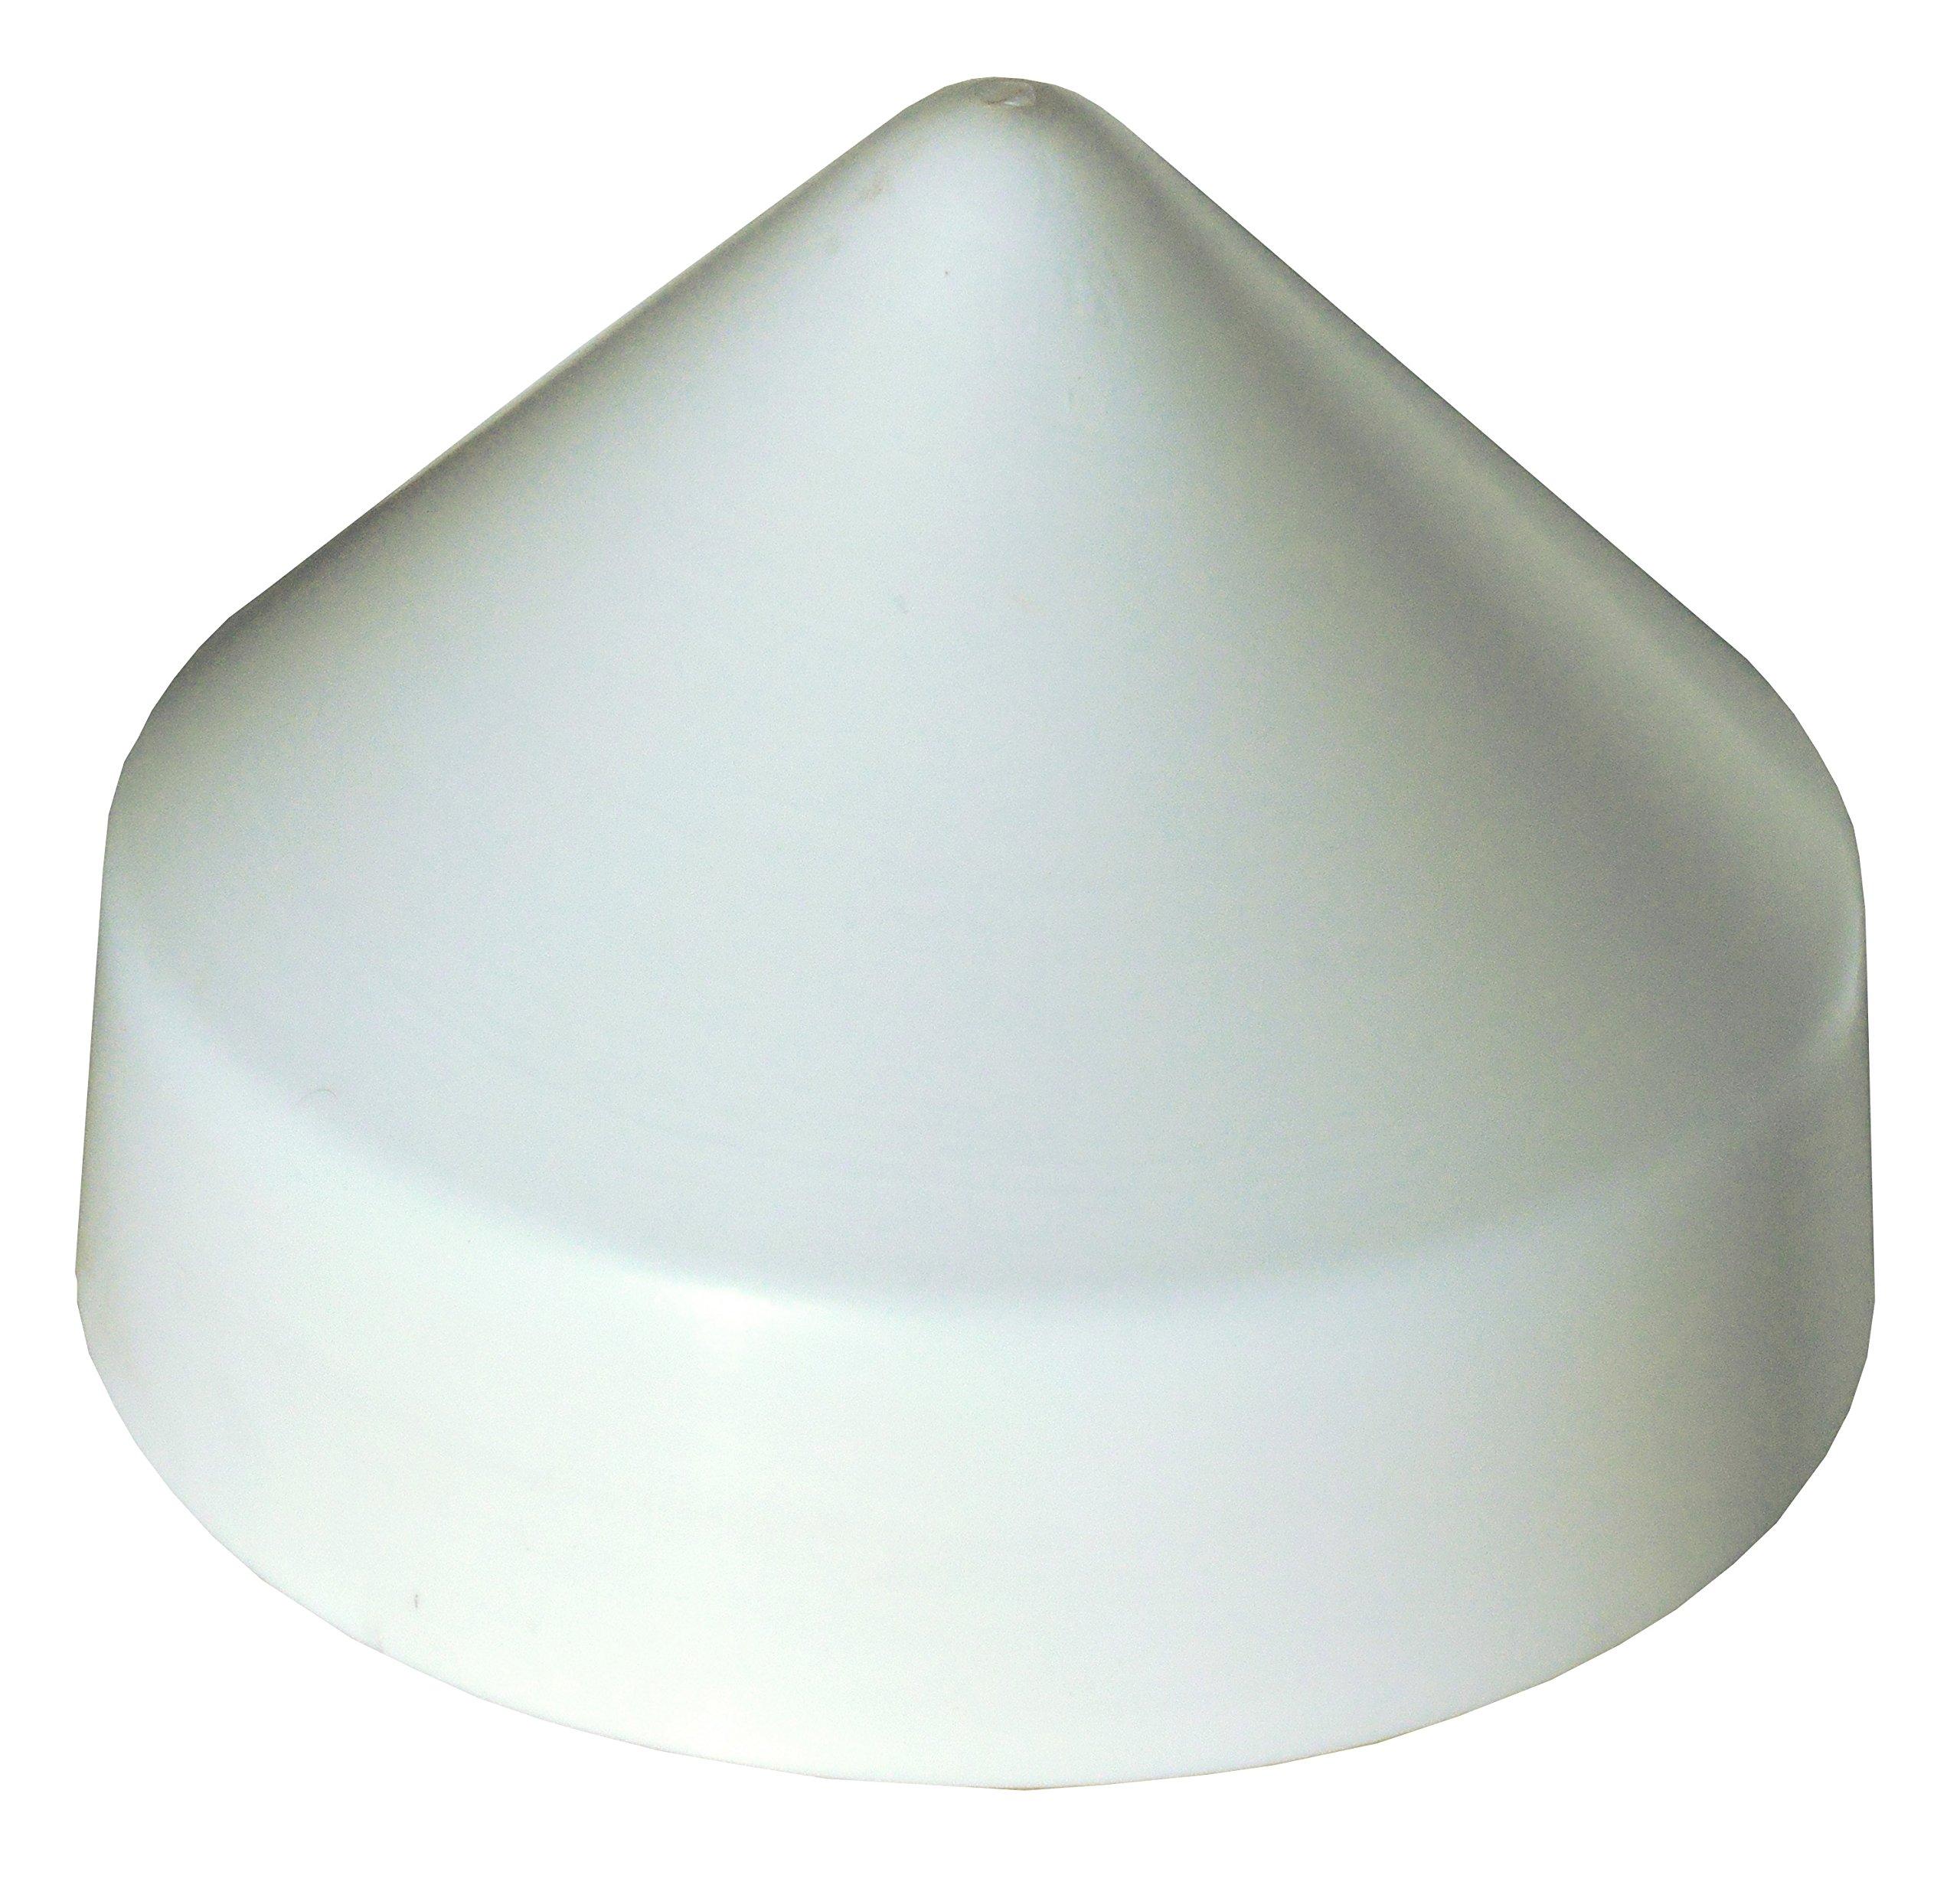 Dock Edge PVC Cone Head Piling Cap, 10-Inch, White